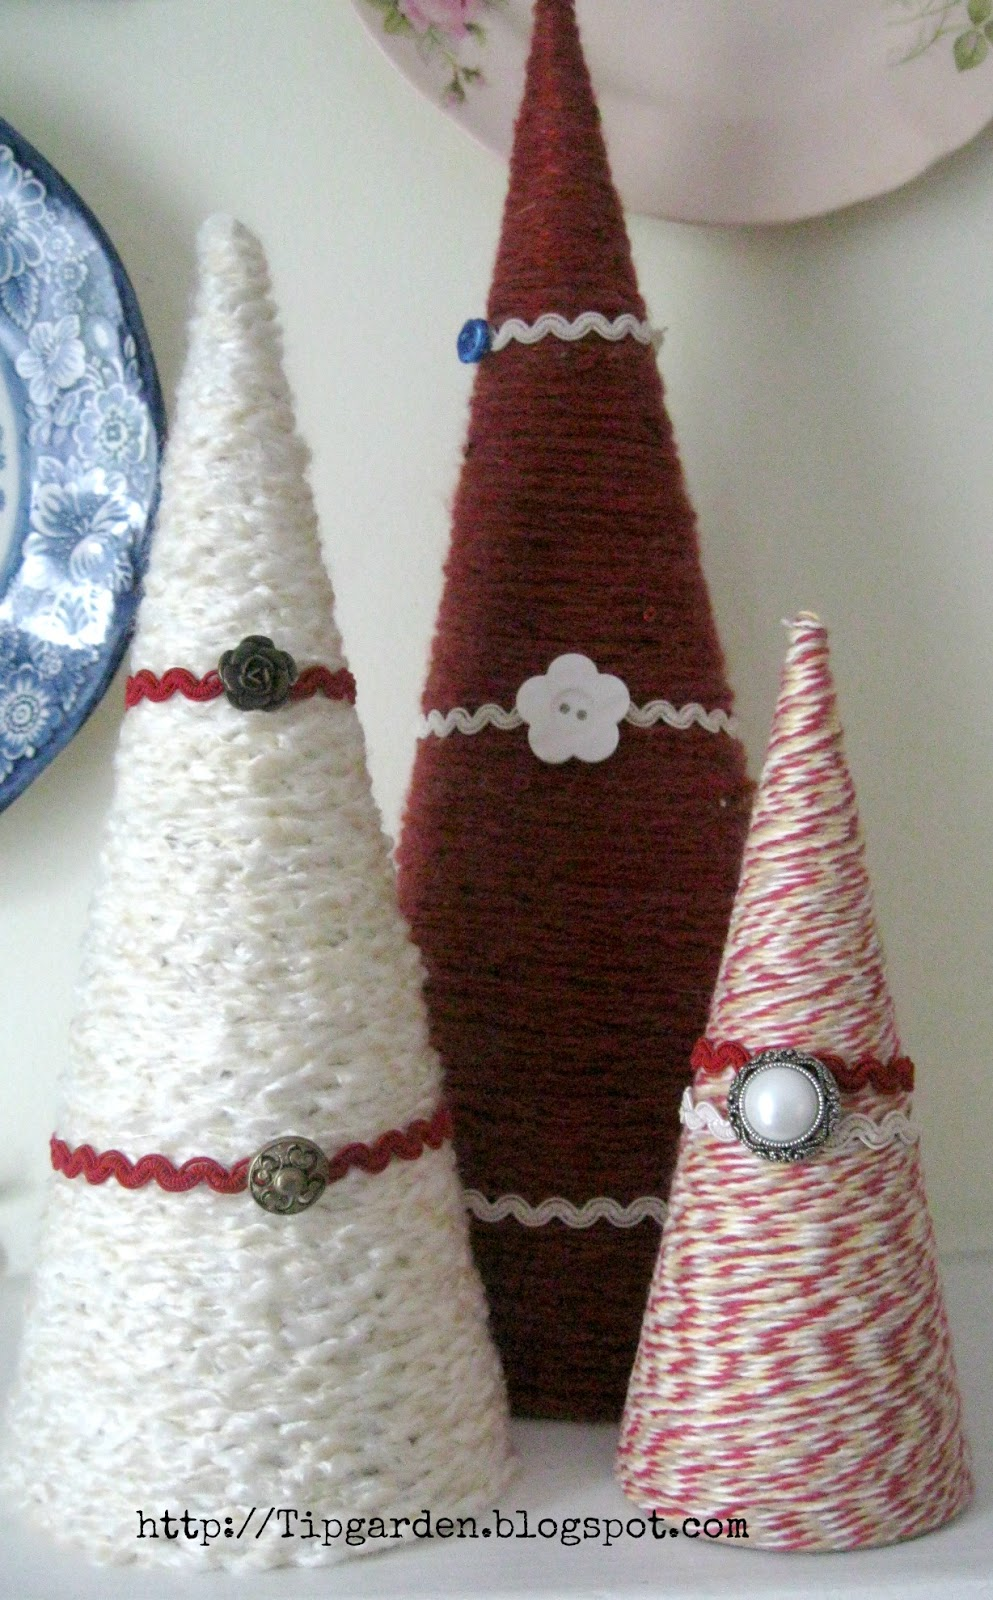 Tip garden crafty christmas yarn tree 39 s for Cheap holiday craft ideas